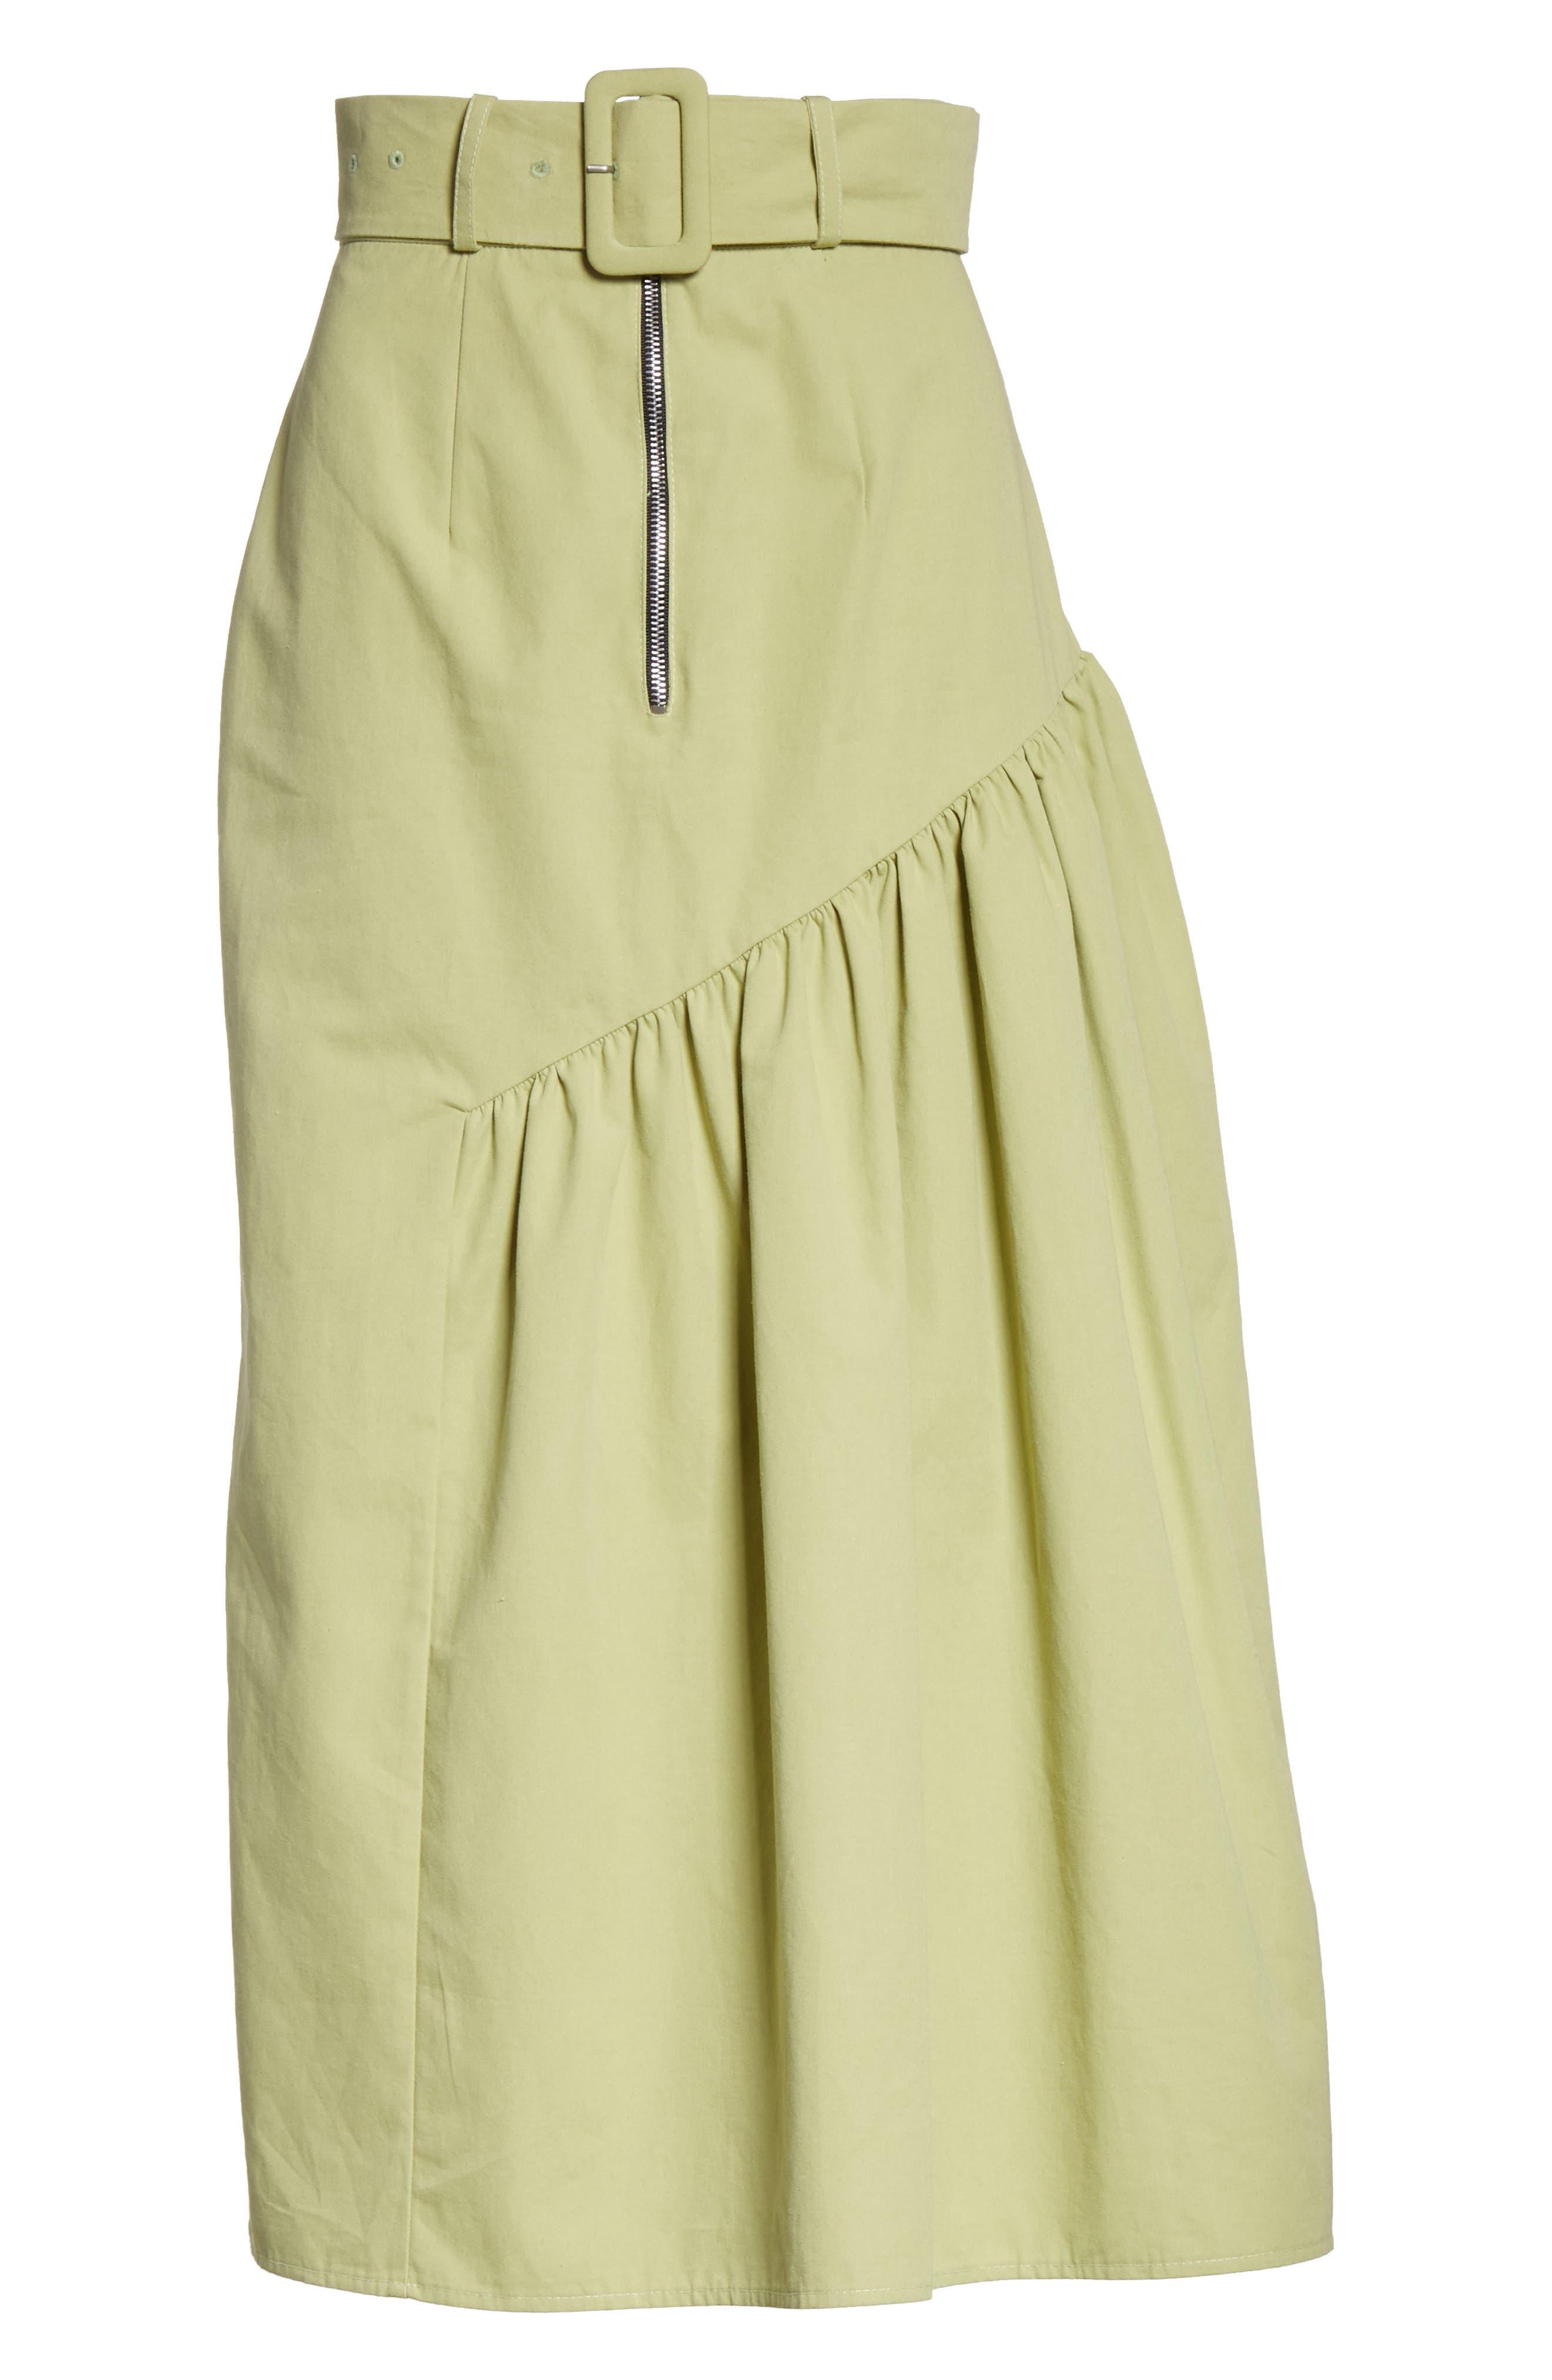 Belted High Waist Ruffle Skirt,                             Alternate thumbnail 6, color,                             370